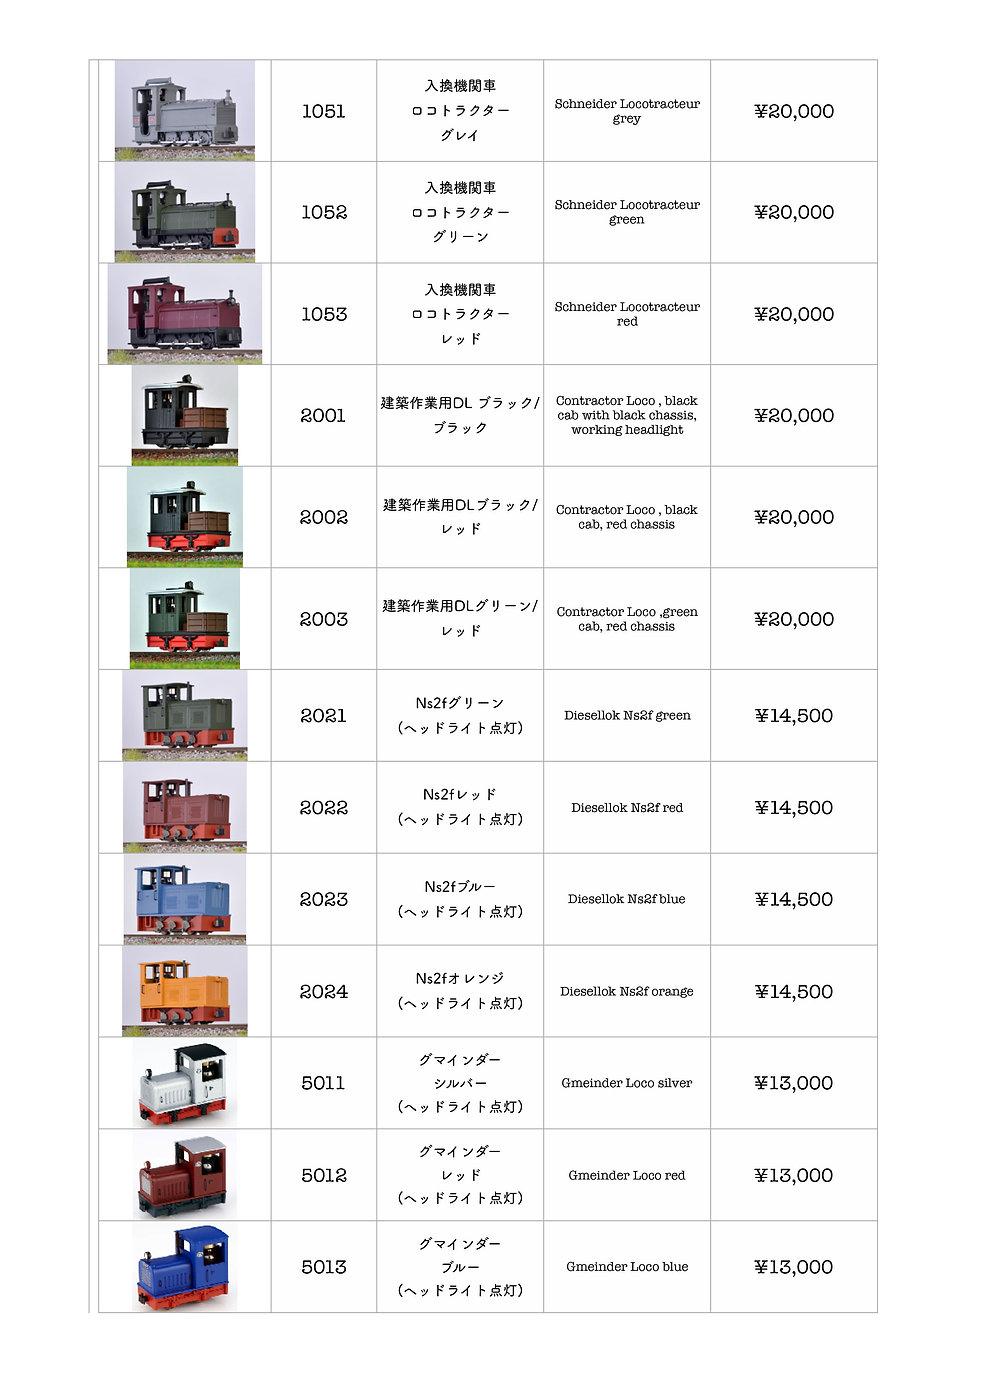 minitrains-dl01.jpg